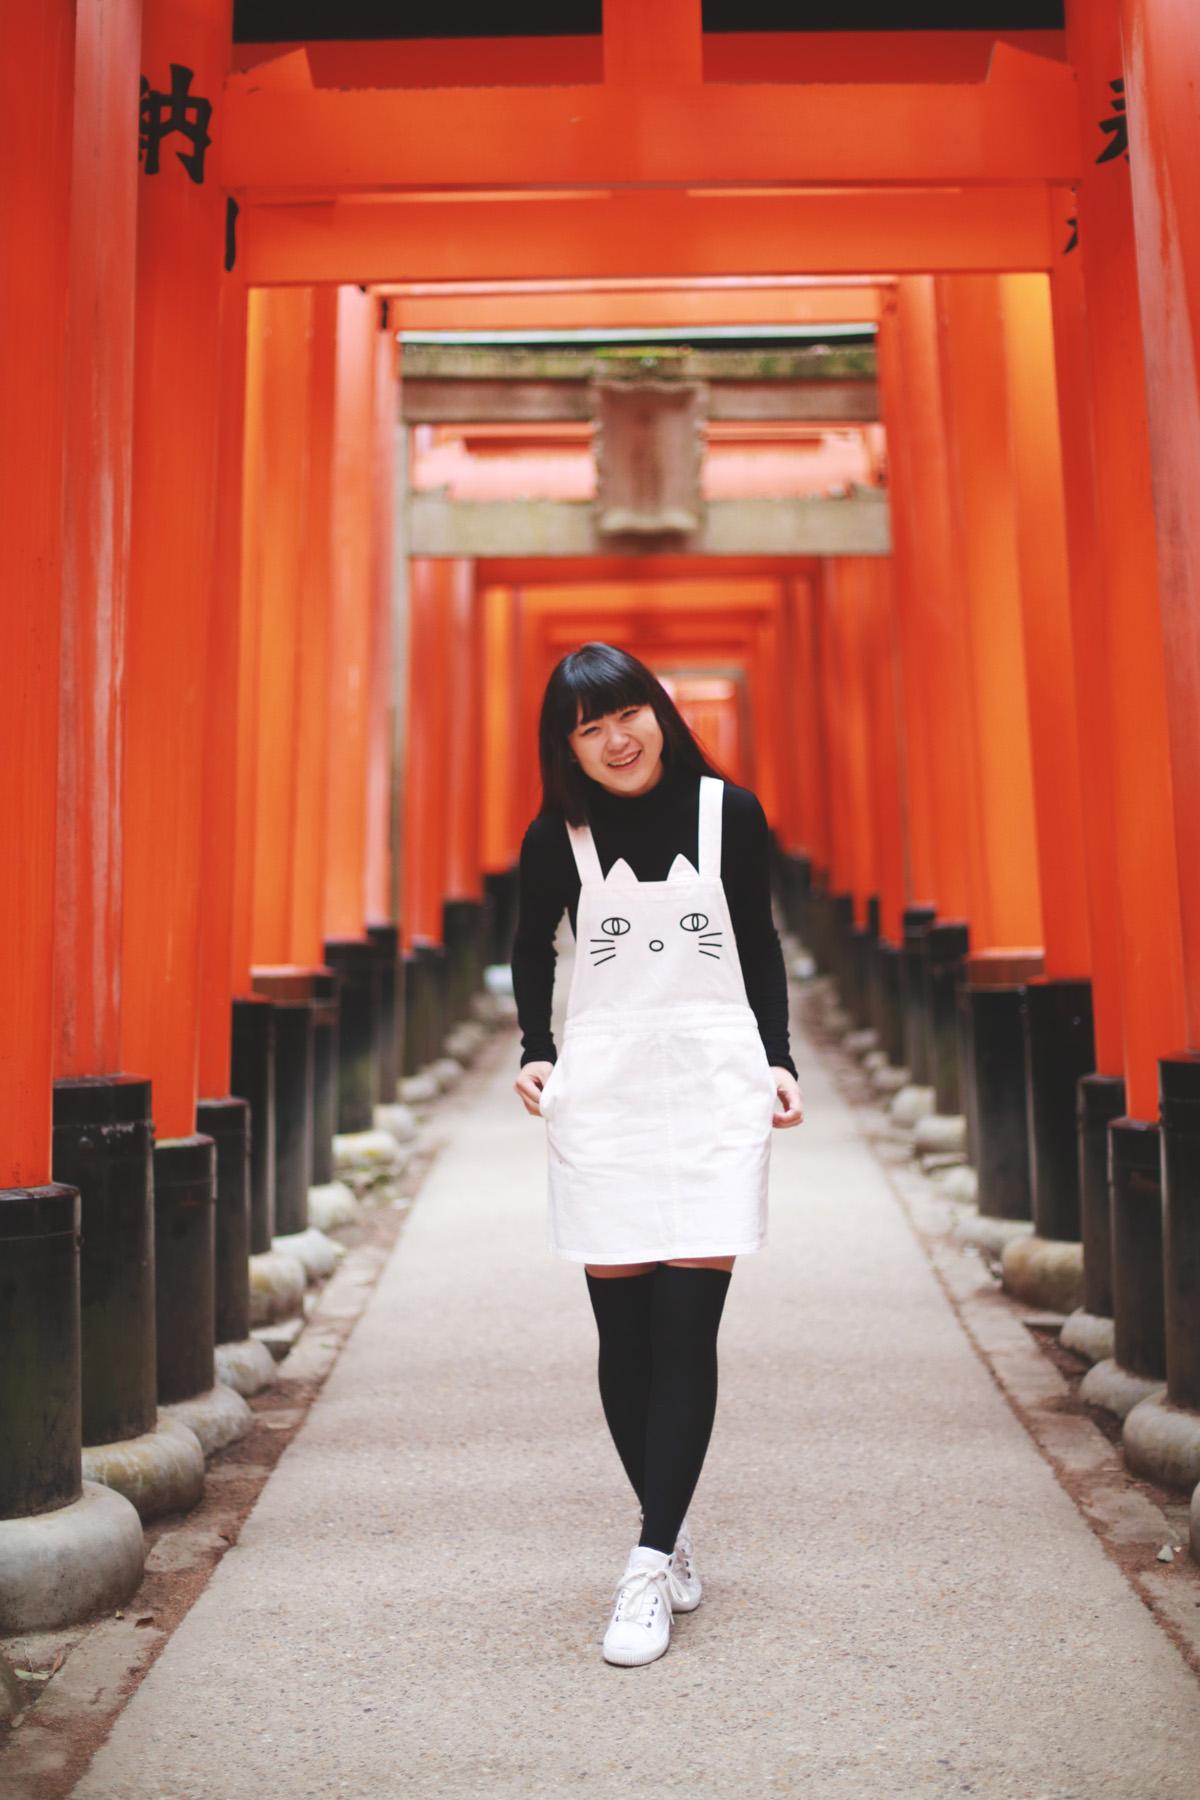 & Away We Went | Inari Shrine | Kyoto, Japan